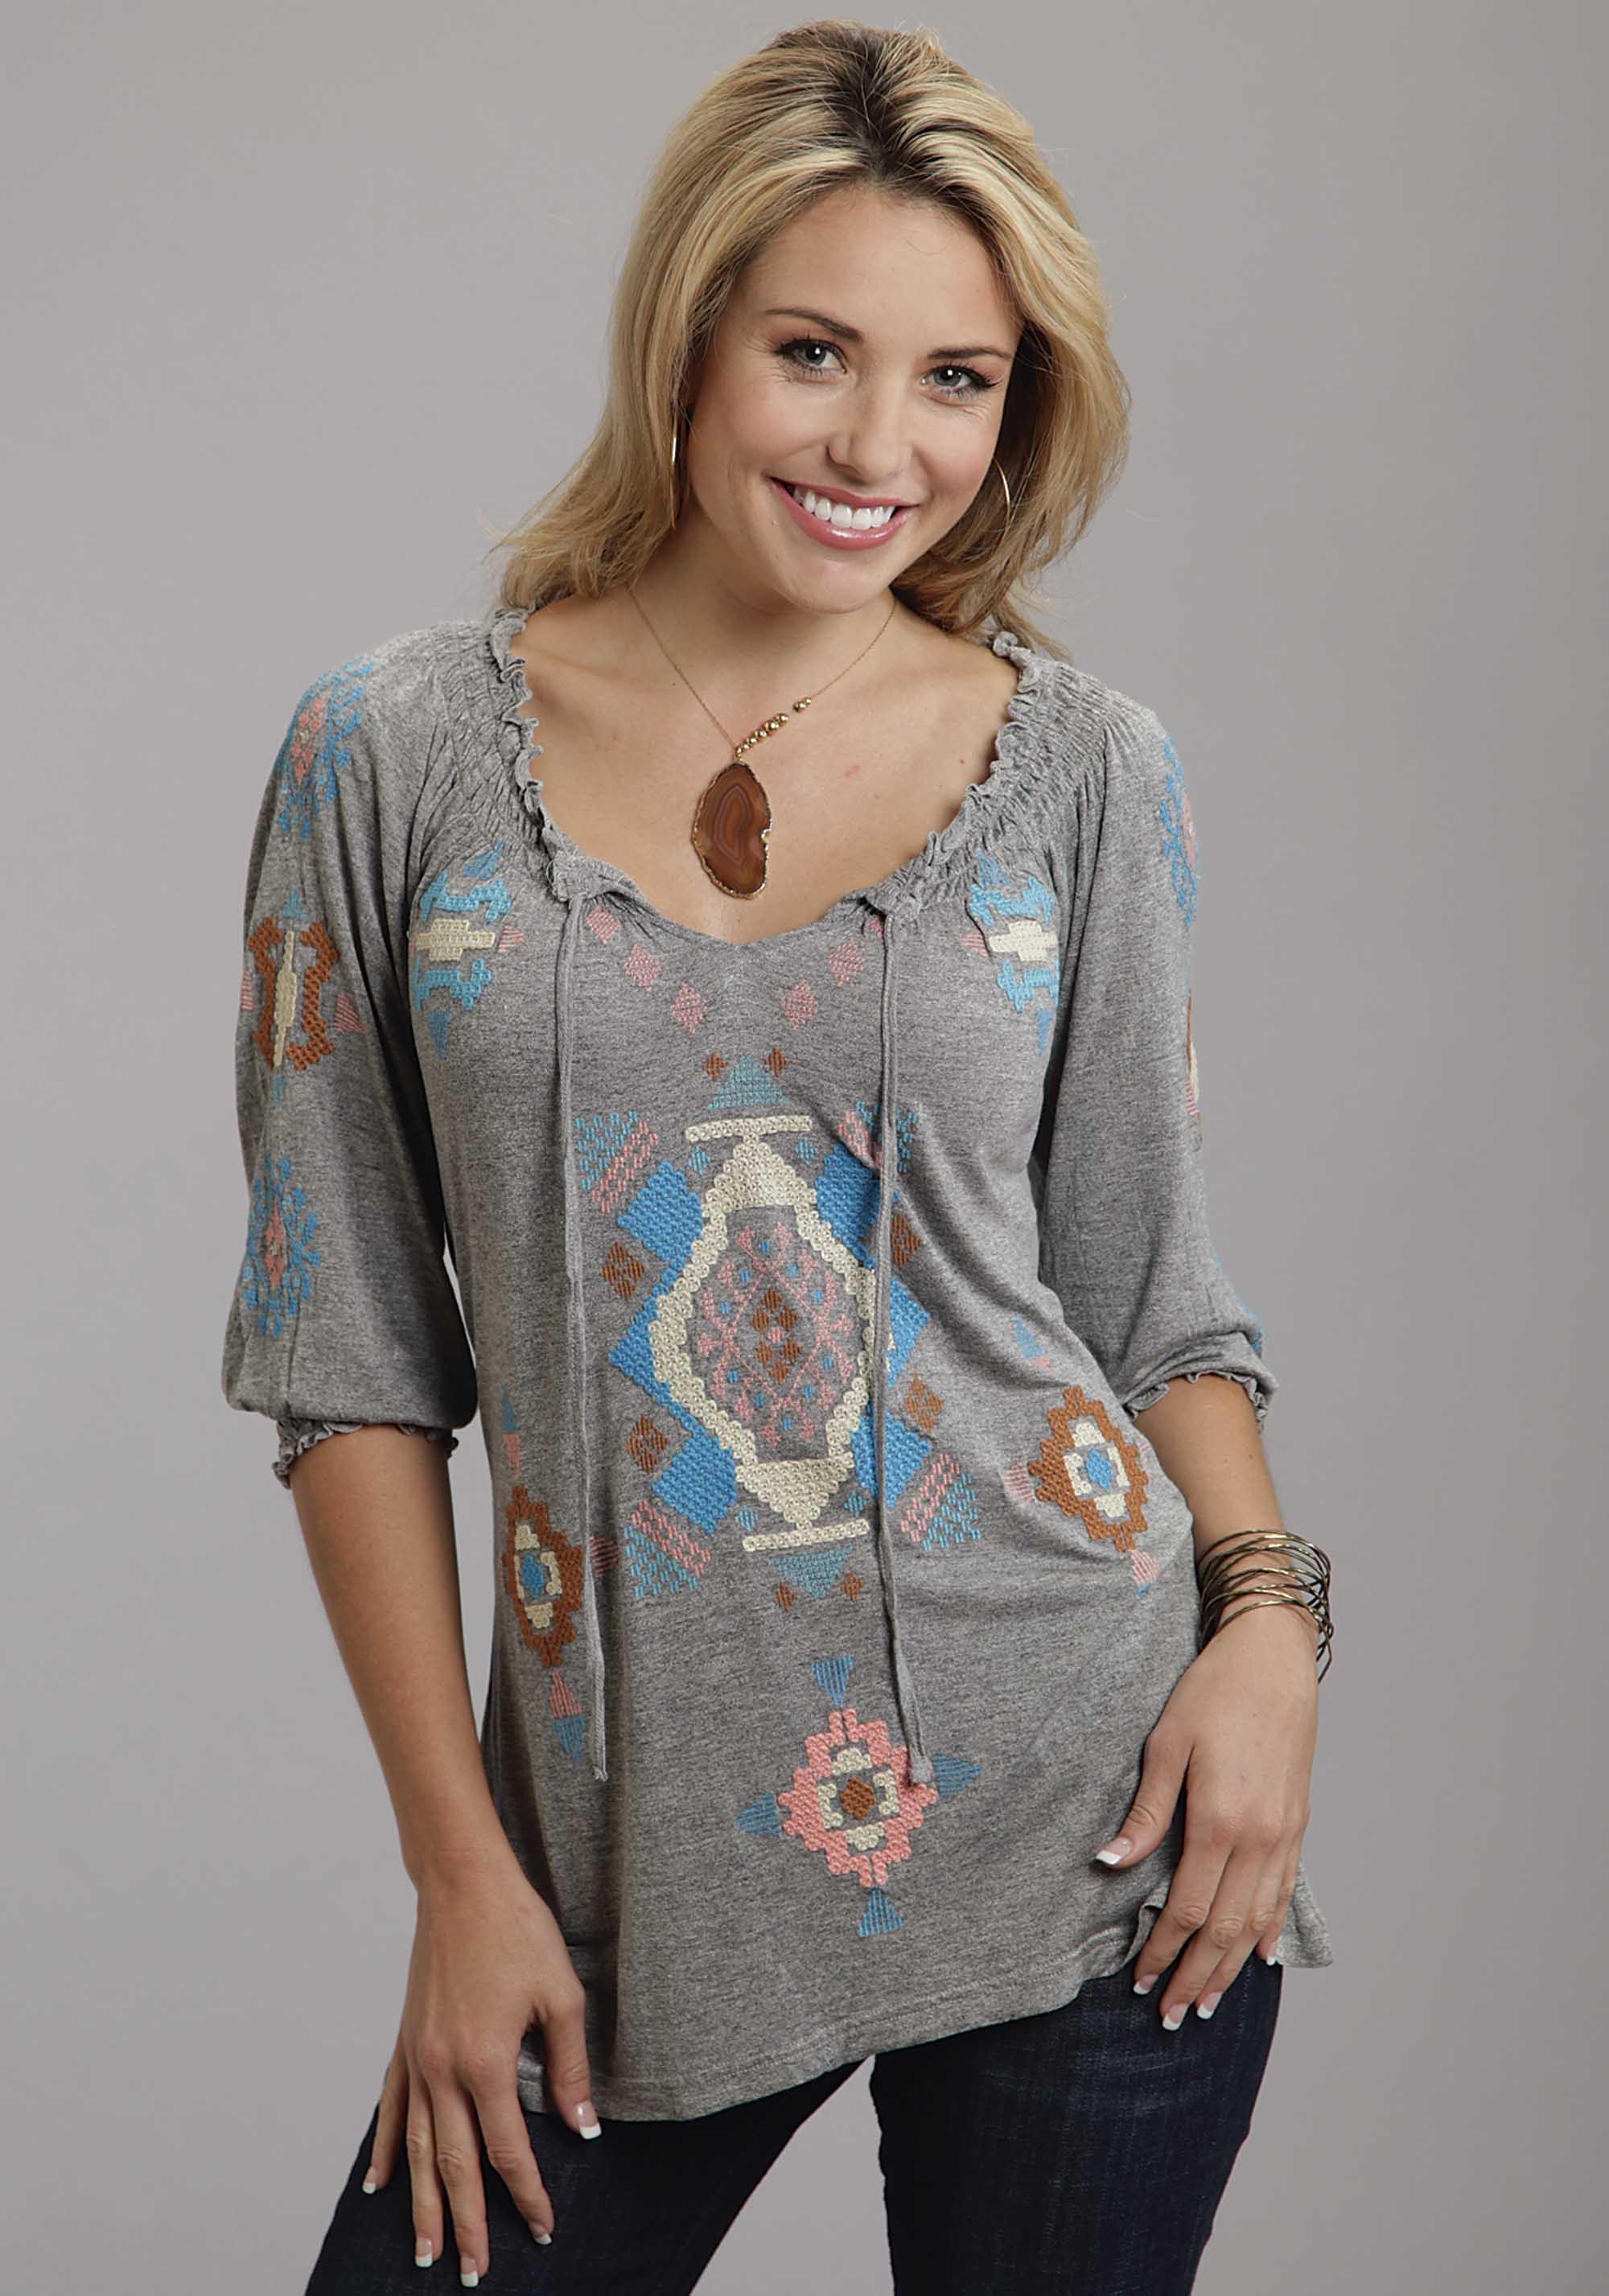 Steston 174 Women S Grey Embroidered 3 4 Sleeve Smocked